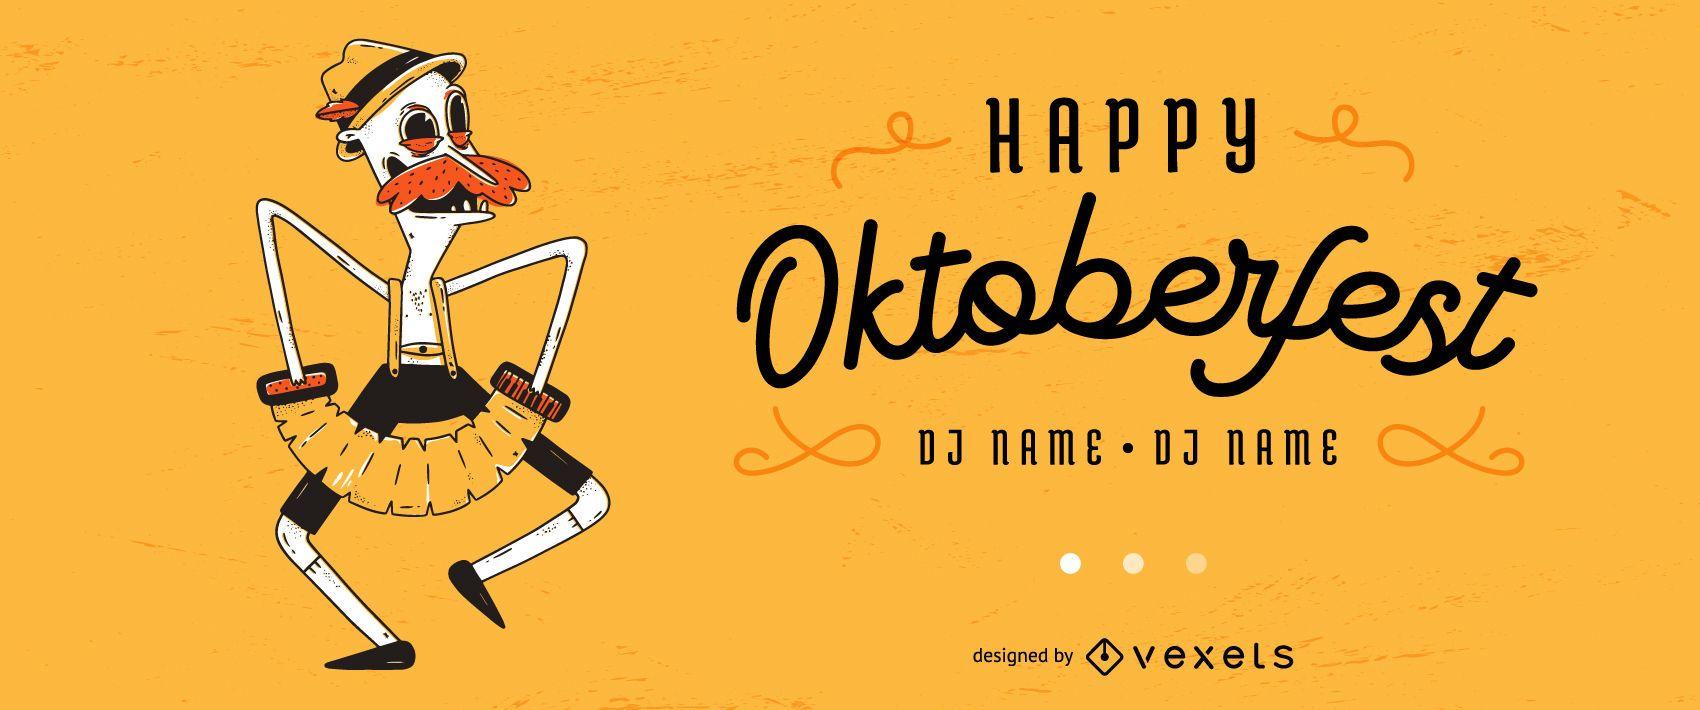 Oktoberfest diseño vectorial de diapositivas editables